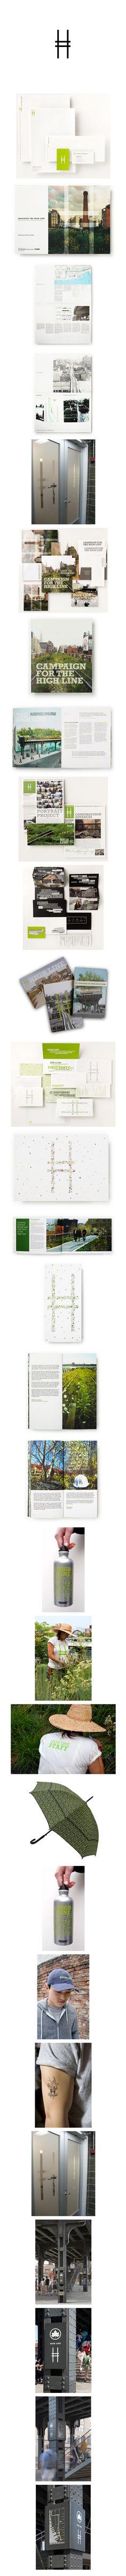 Paula Scher, Pentagram Design - The High Line